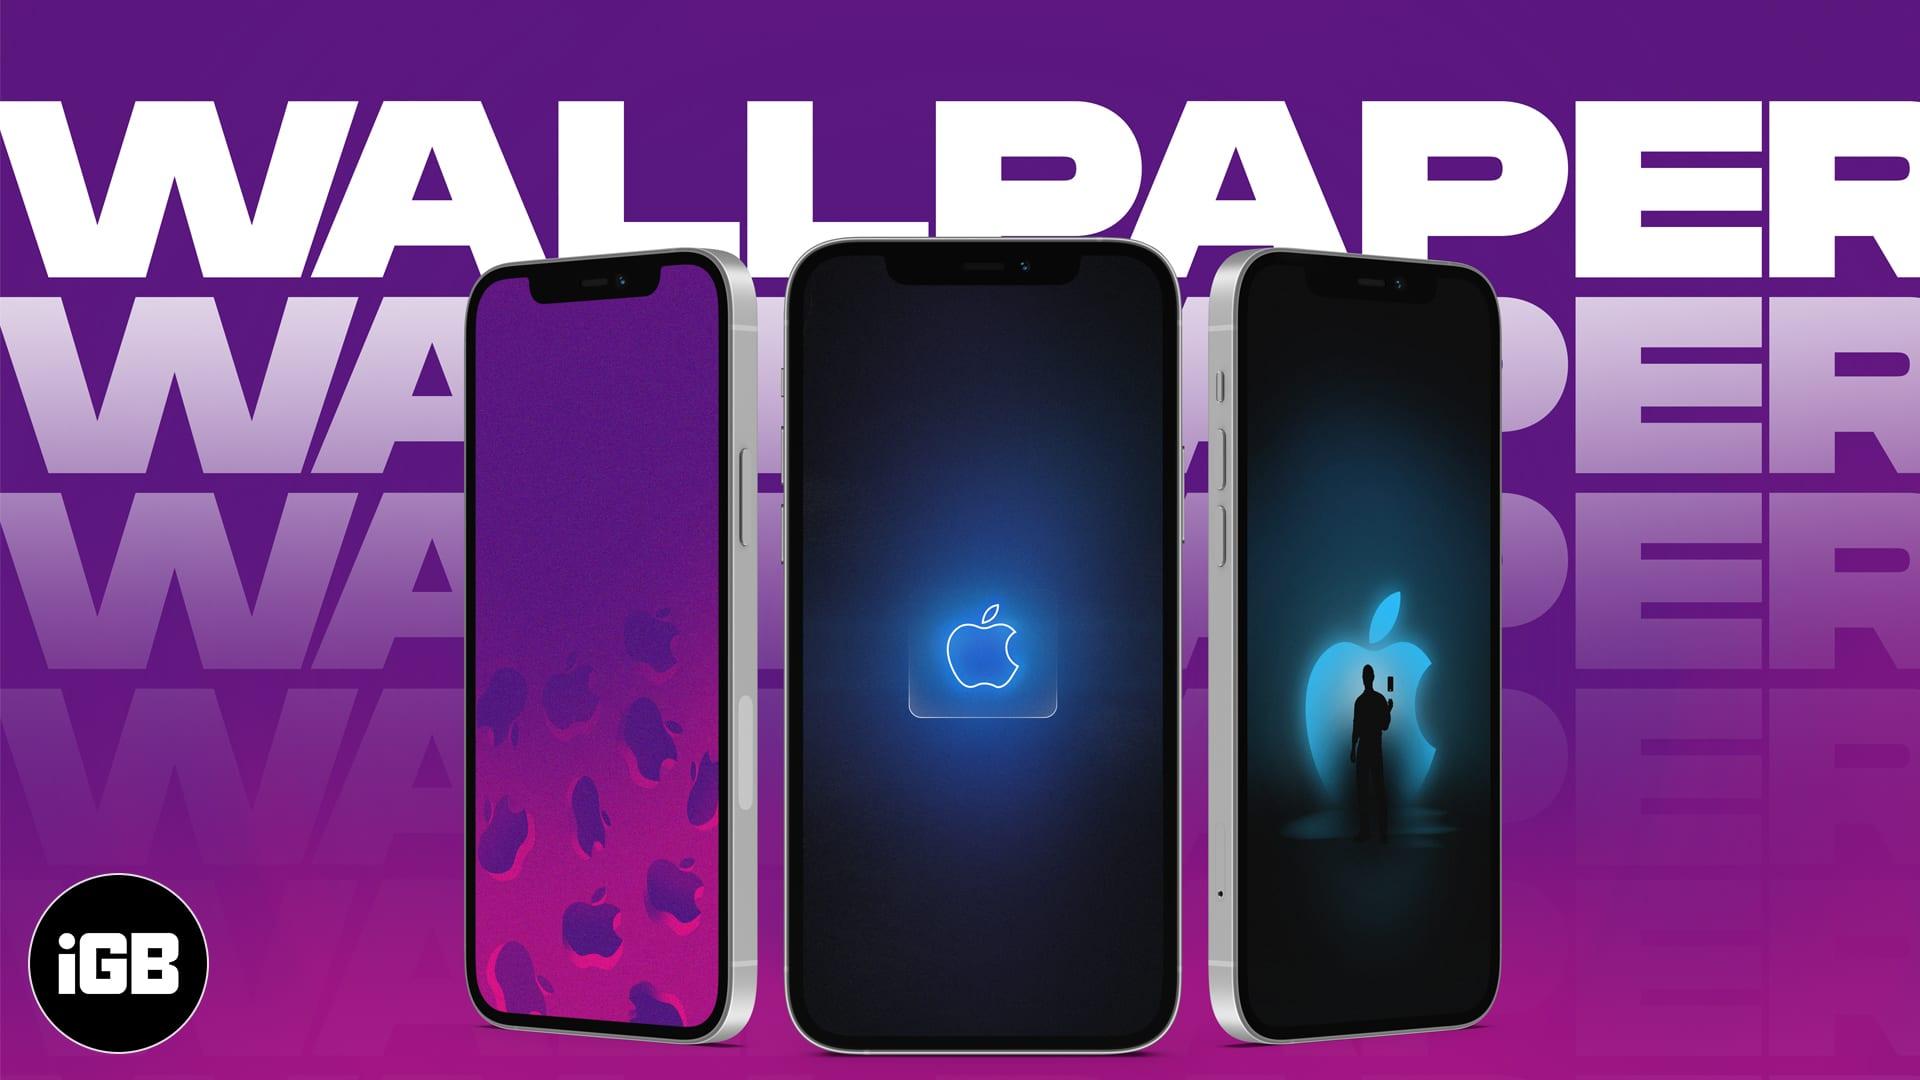 21 Stunning Apple logo wallpapers for iPhone   iGeeksBlog